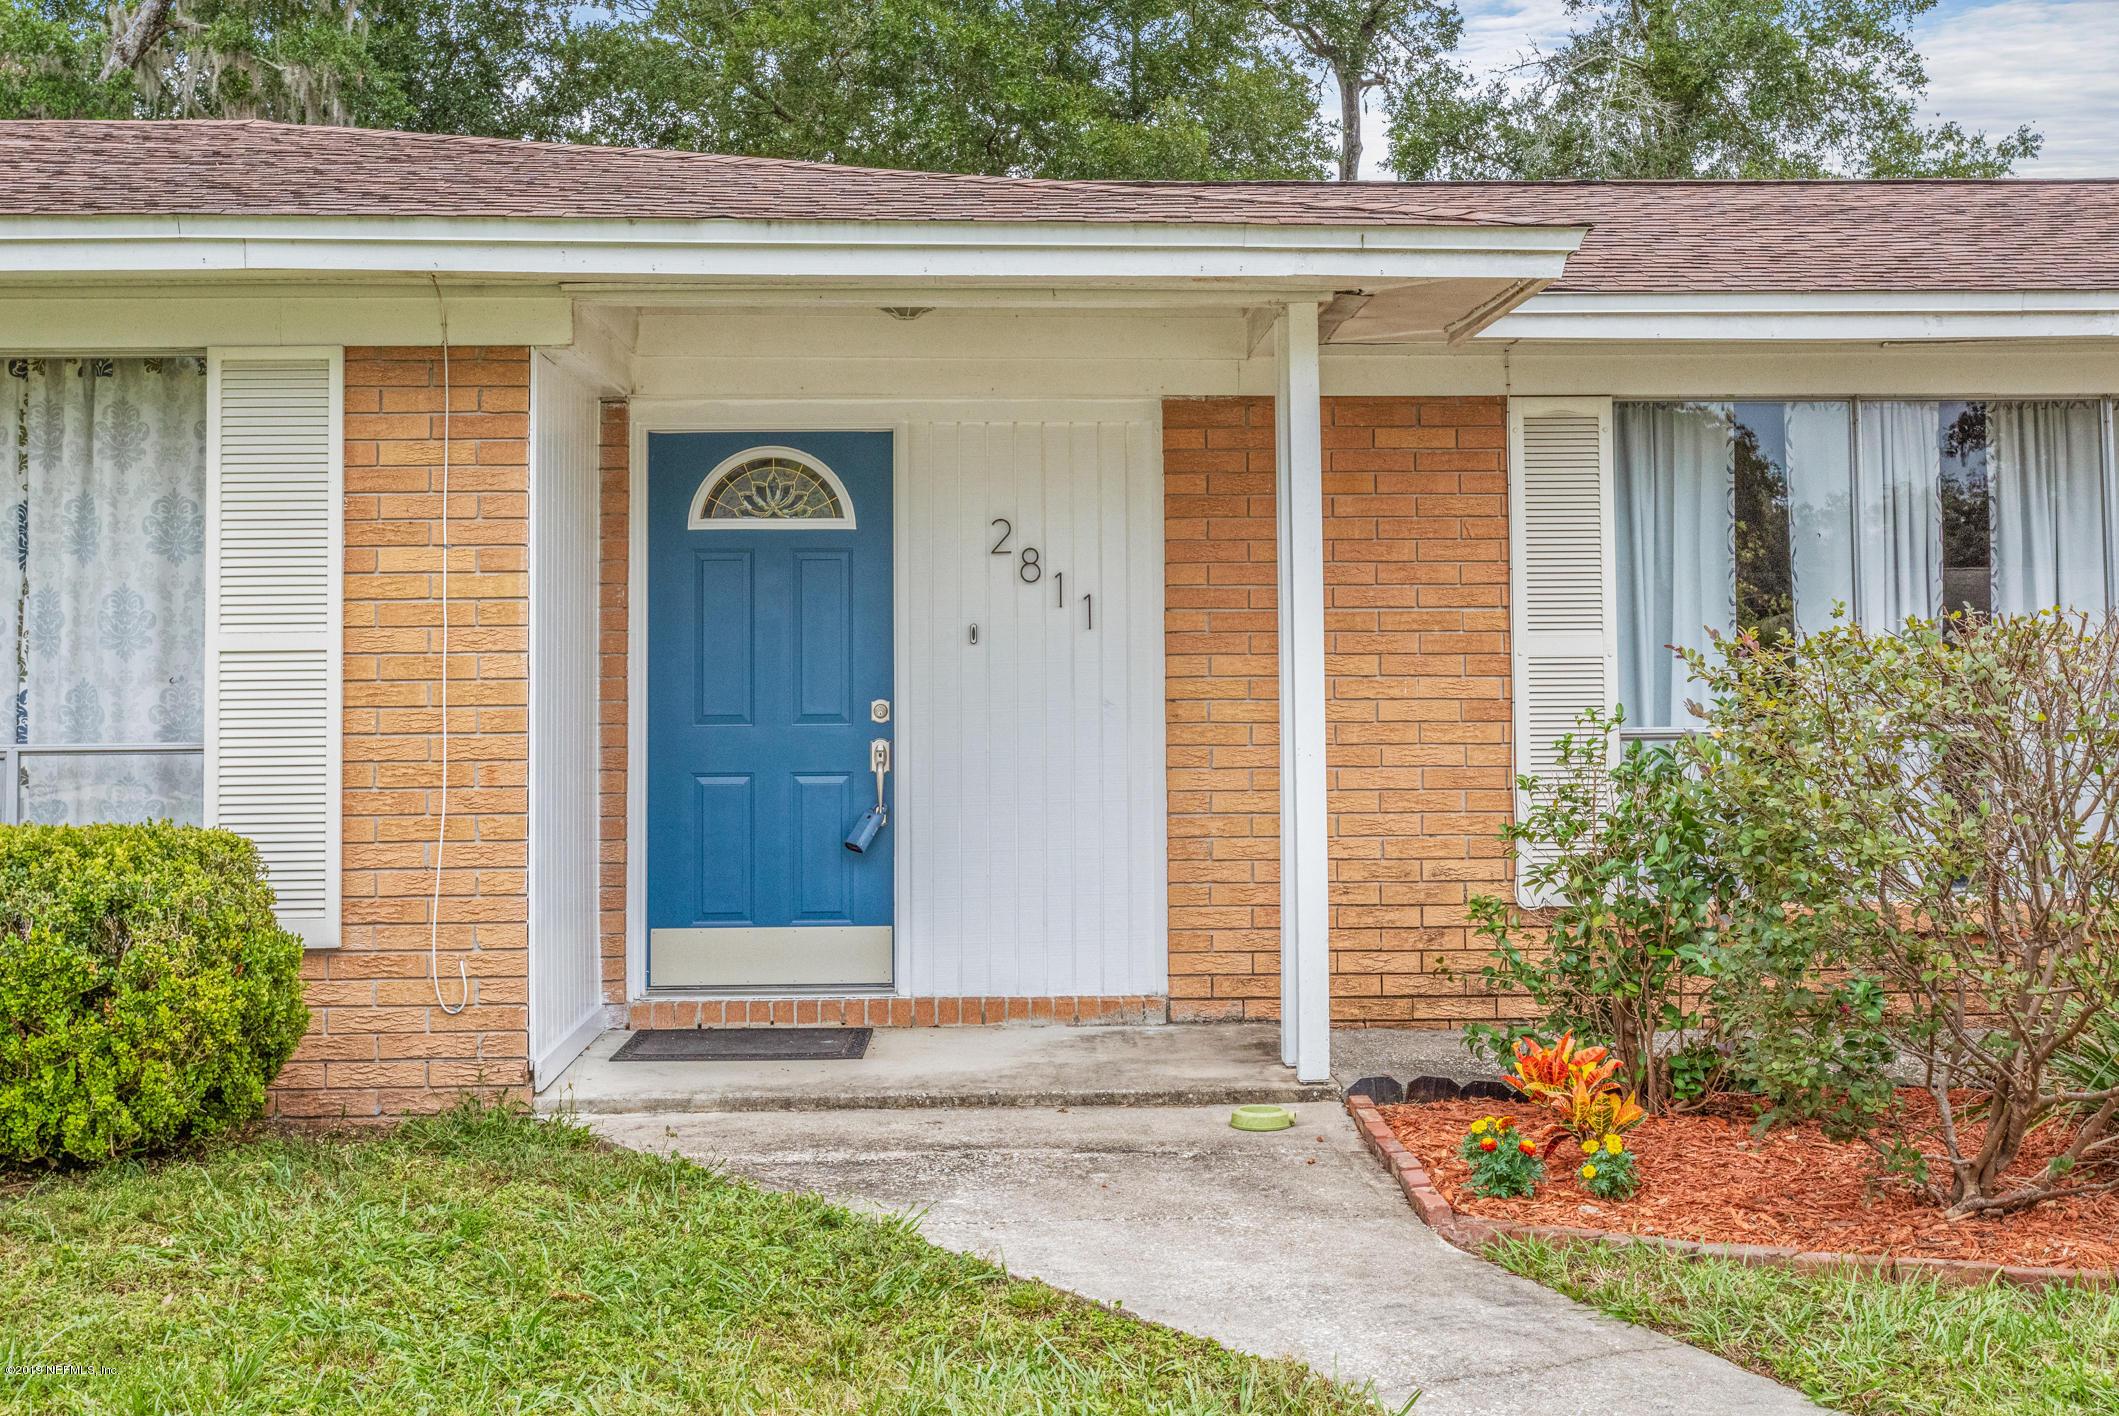 2811 GREENRIDGE, ORANGE PARK, FLORIDA 32073, 4 Bedrooms Bedrooms, ,2 BathroomsBathrooms,Residential - single family,For sale,GREENRIDGE,1021447